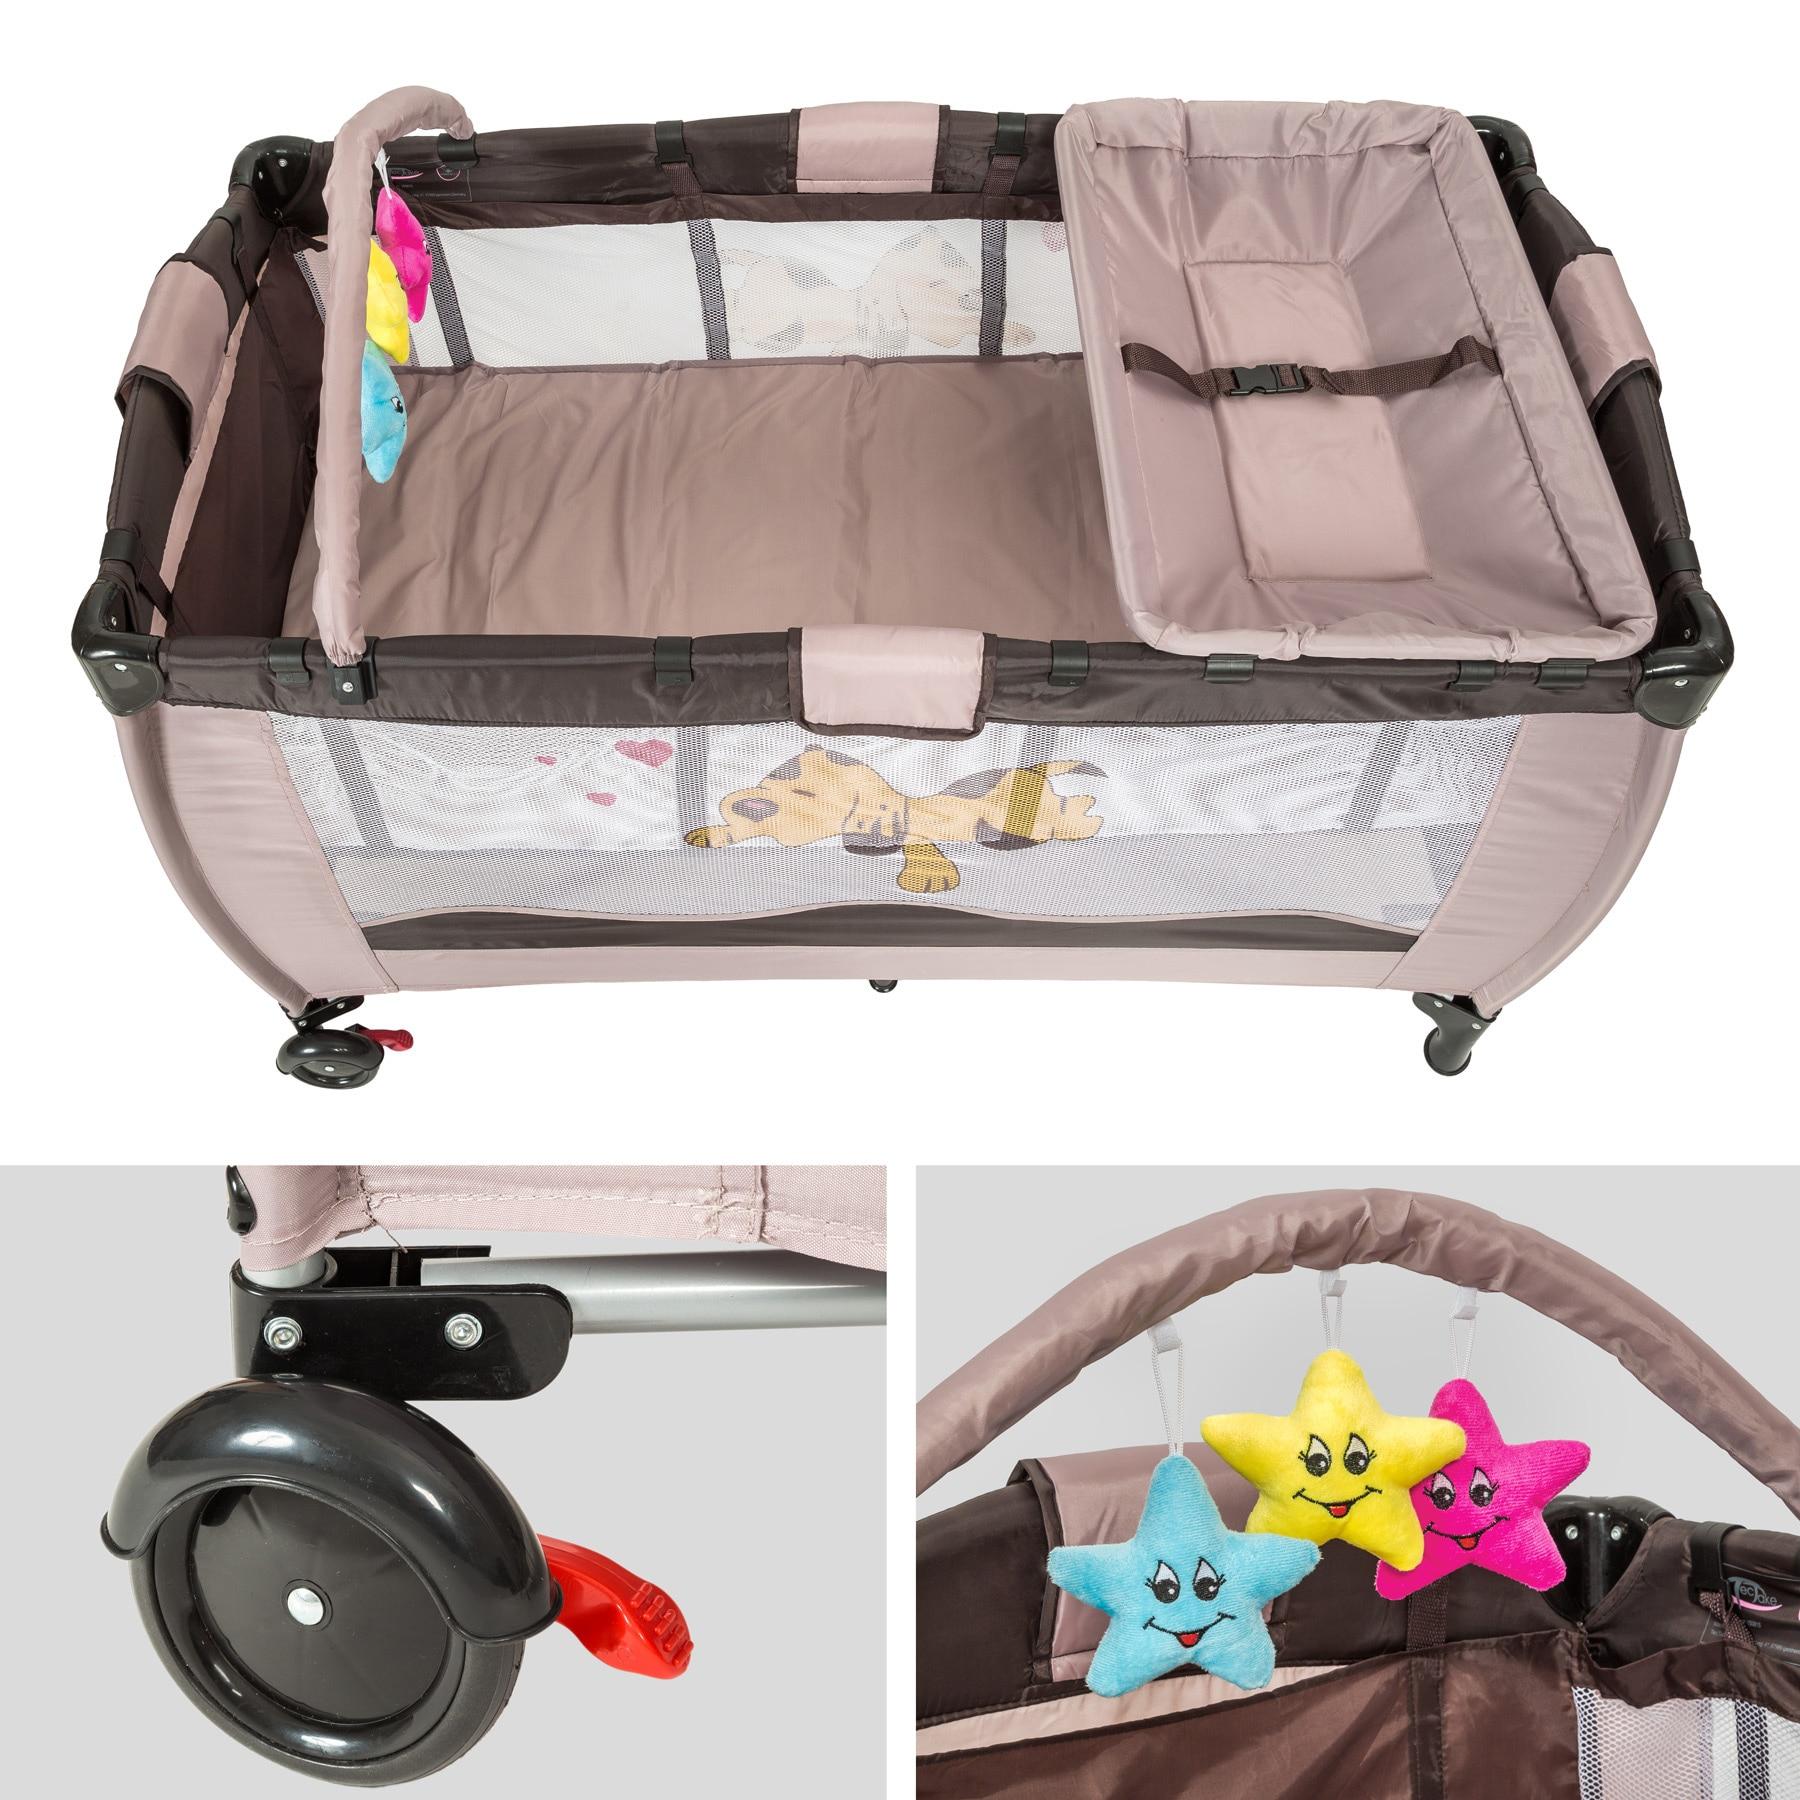 Whole Sale Portable Baby Crib Nursery Travel Folding Bed Bag Infant Toddler Cradle Multifunction Storage Bag For Baby Care HWC